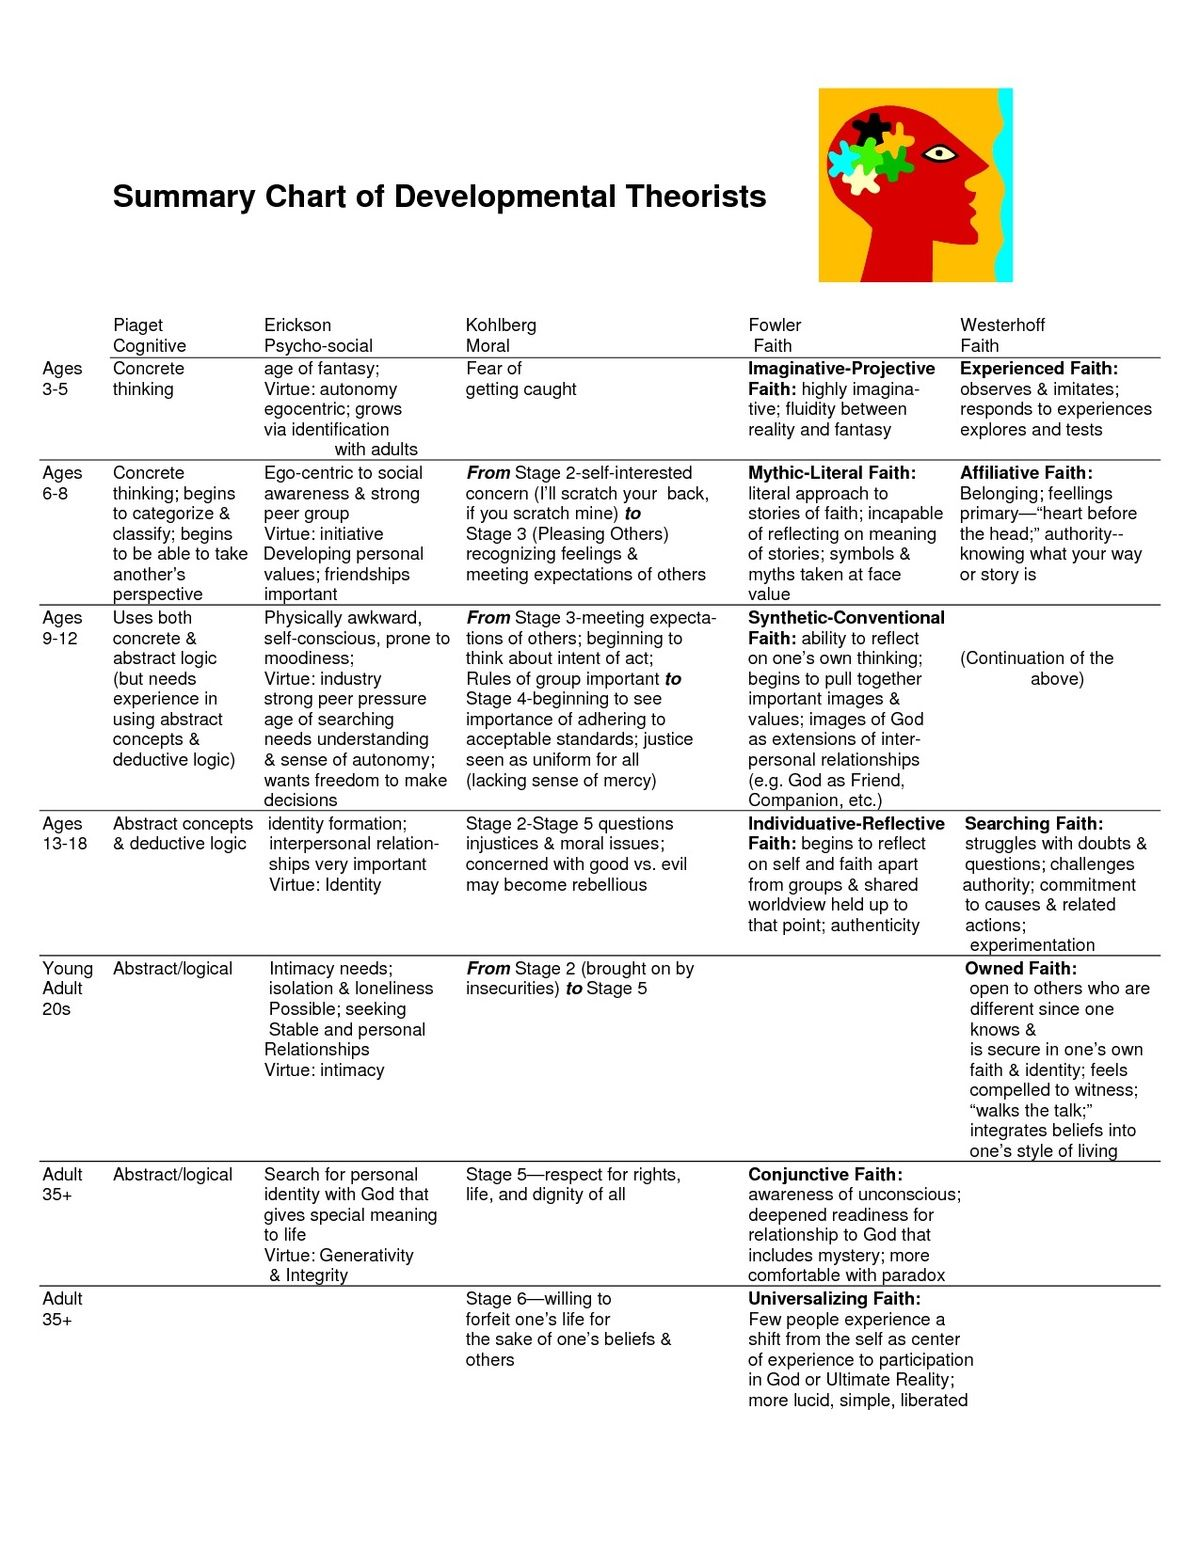 A73a6b006c9c9169fea876c0a276d2fb Jpg 1 200 1 552 Pixels Social Work Theories Social Work Exam Developmental Psychology